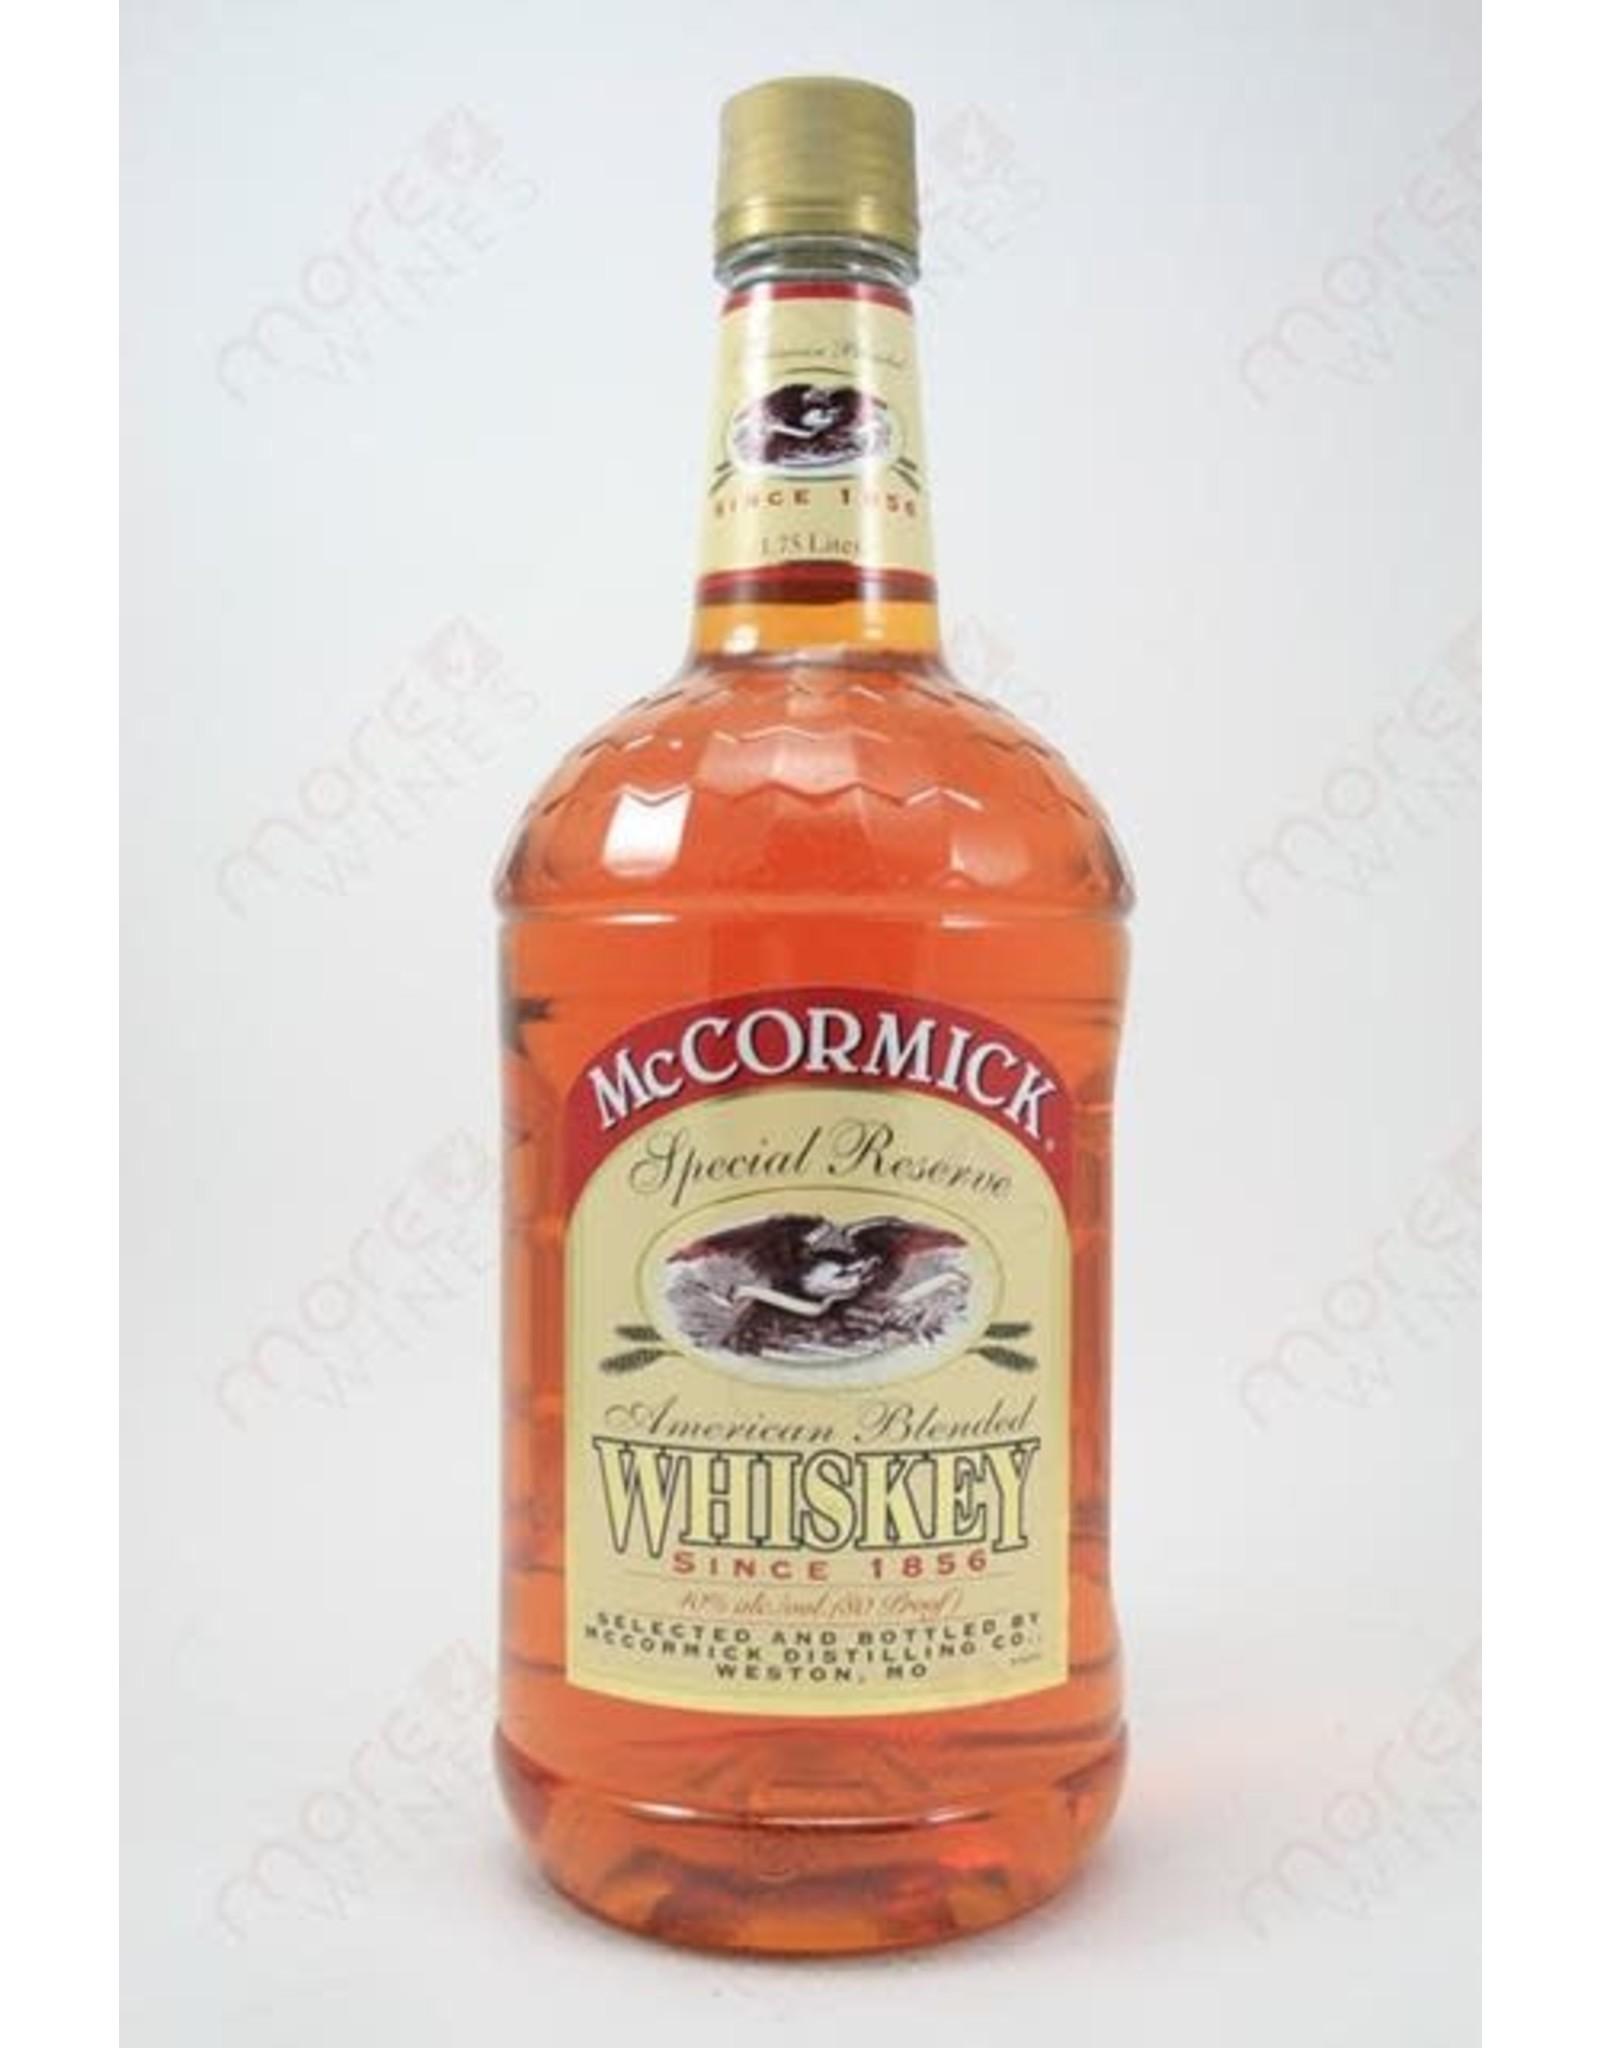 MCCORMICK WHISKEY 1.75L